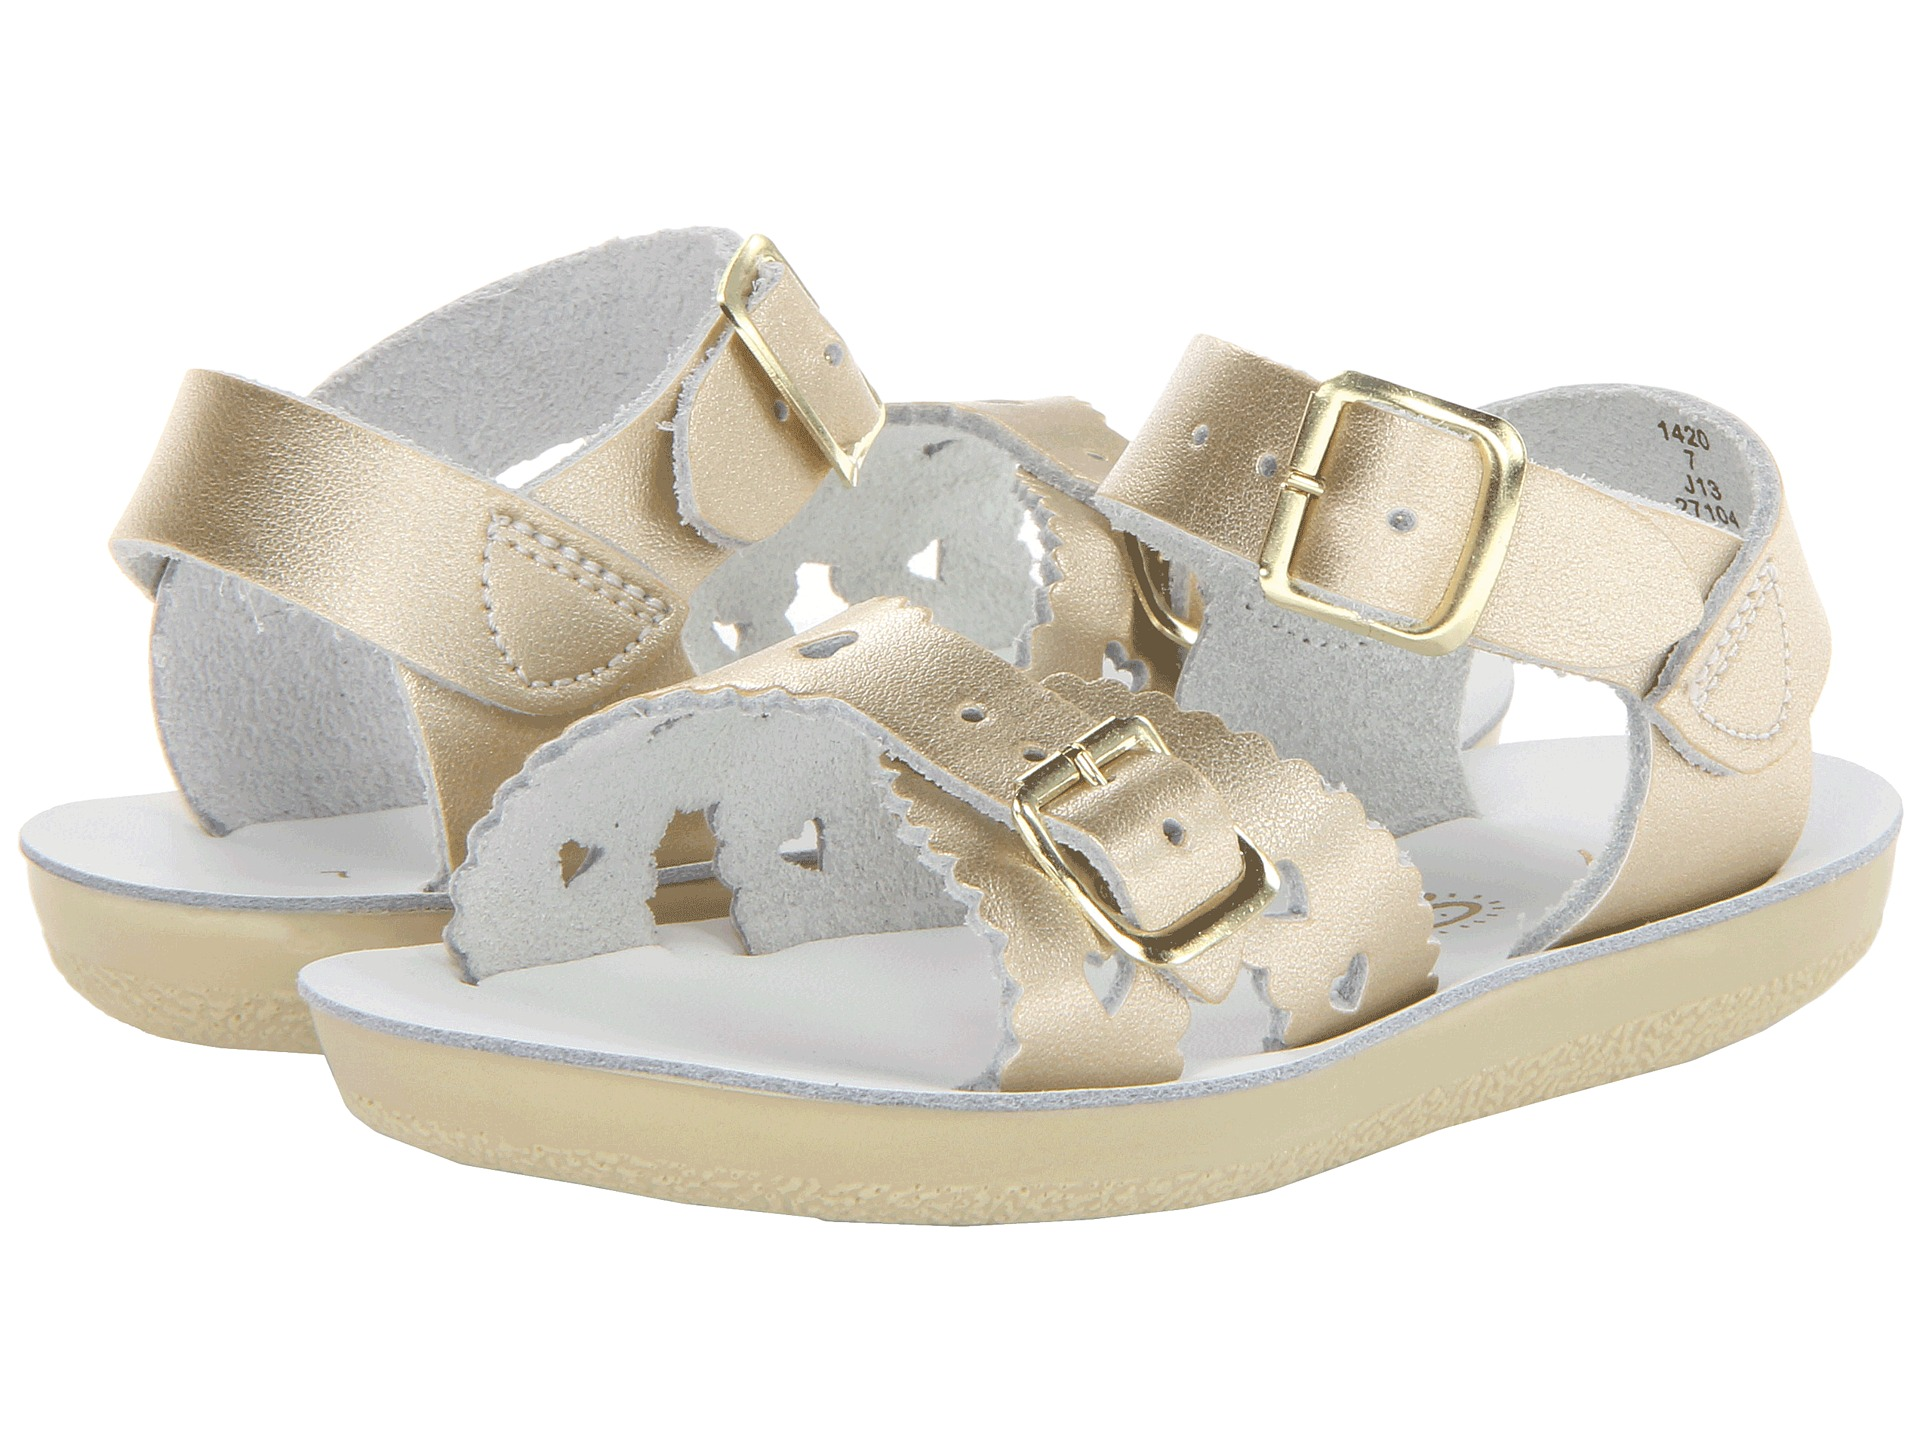 salt water sandal by hoy shoes sun san sweetheart toddler little kid free. Black Bedroom Furniture Sets. Home Design Ideas